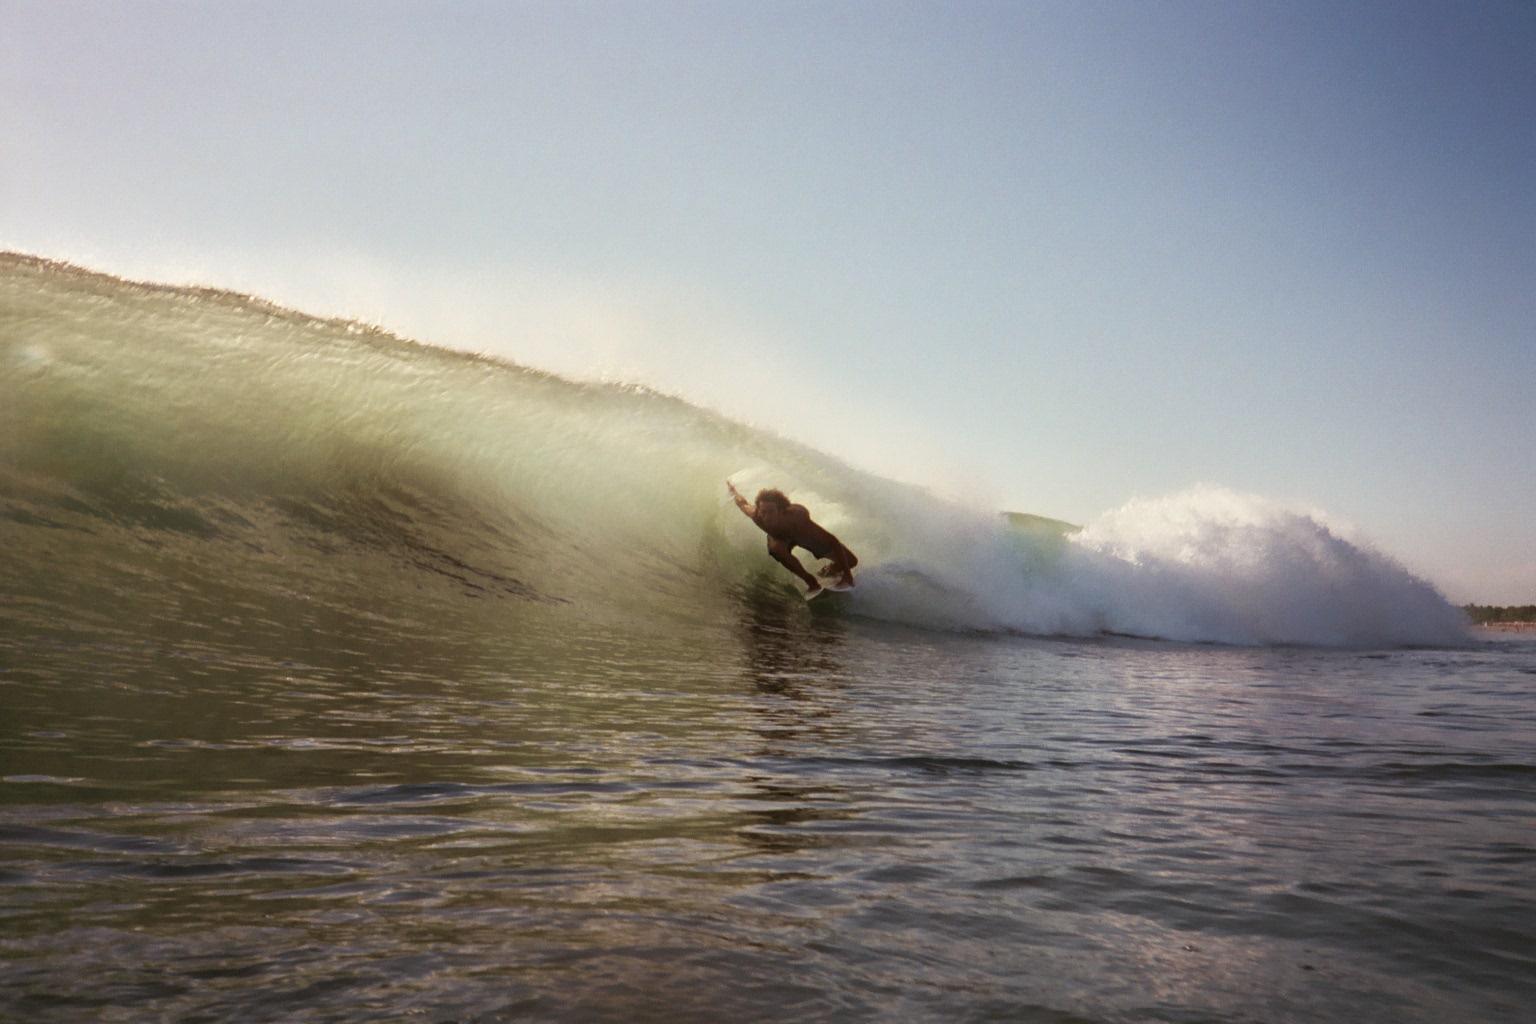 Surfing Wallpaper Pictures For Desktop Hd 10428 Wallpaper 1536x1024